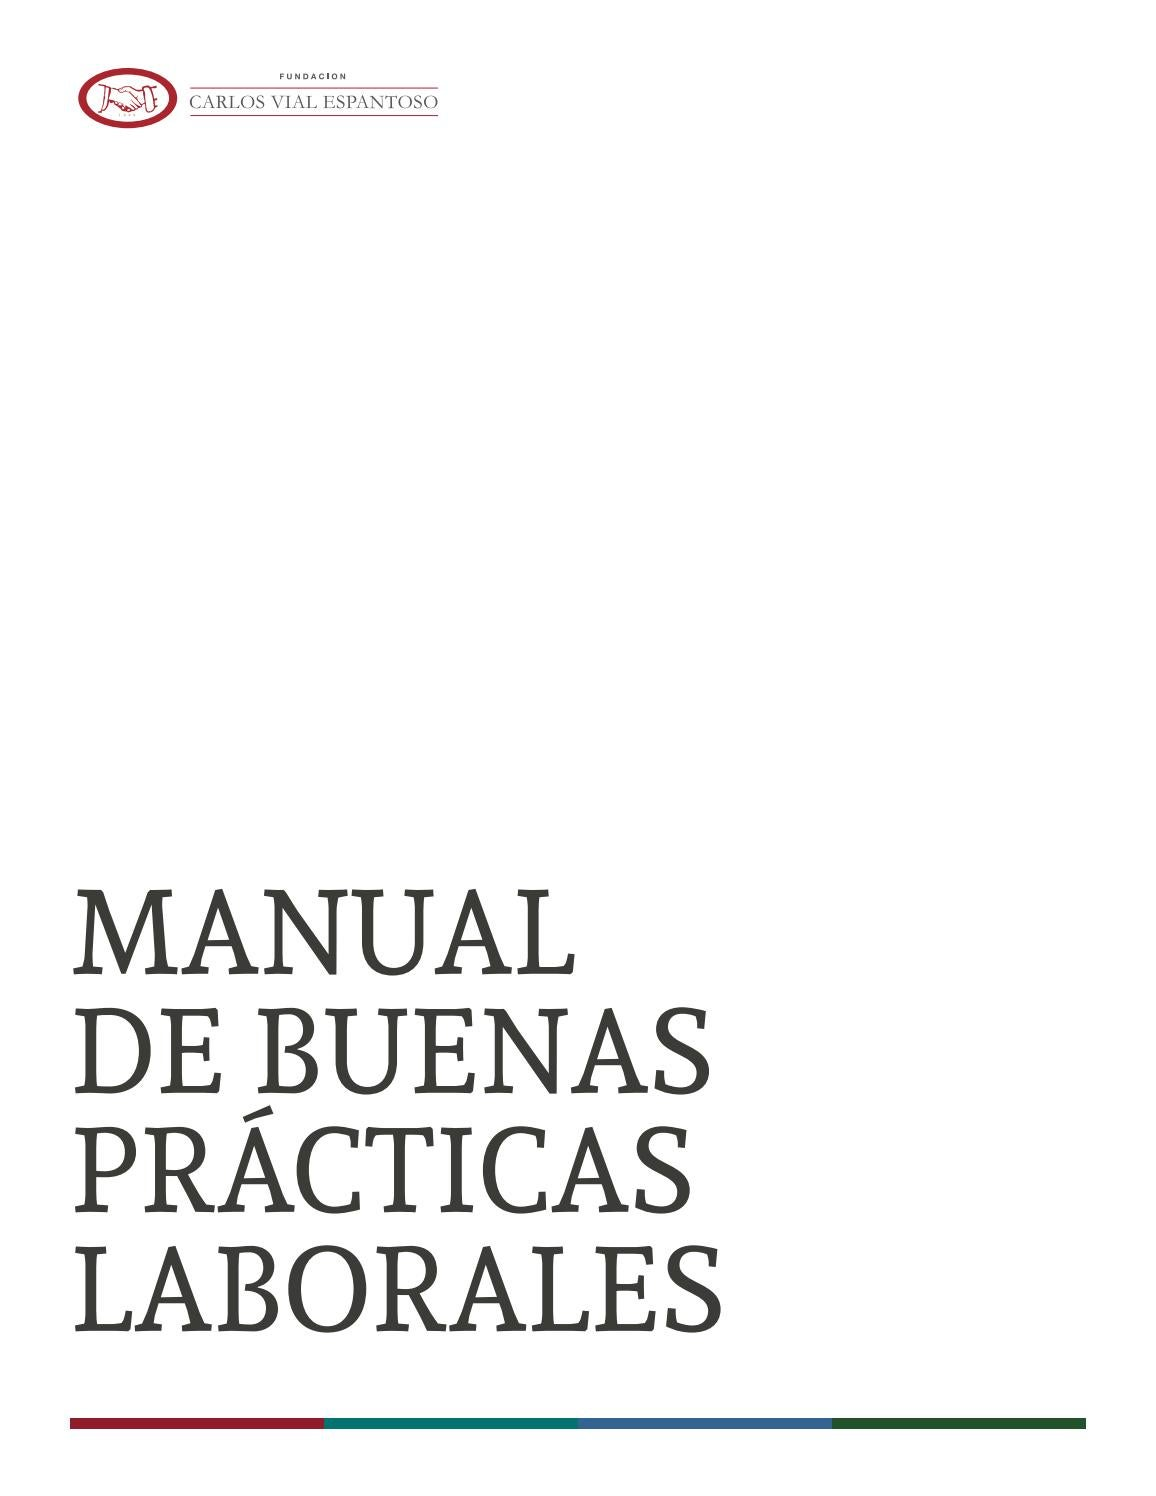 Manual de buenas prácticas descargable (2) by Fundacion